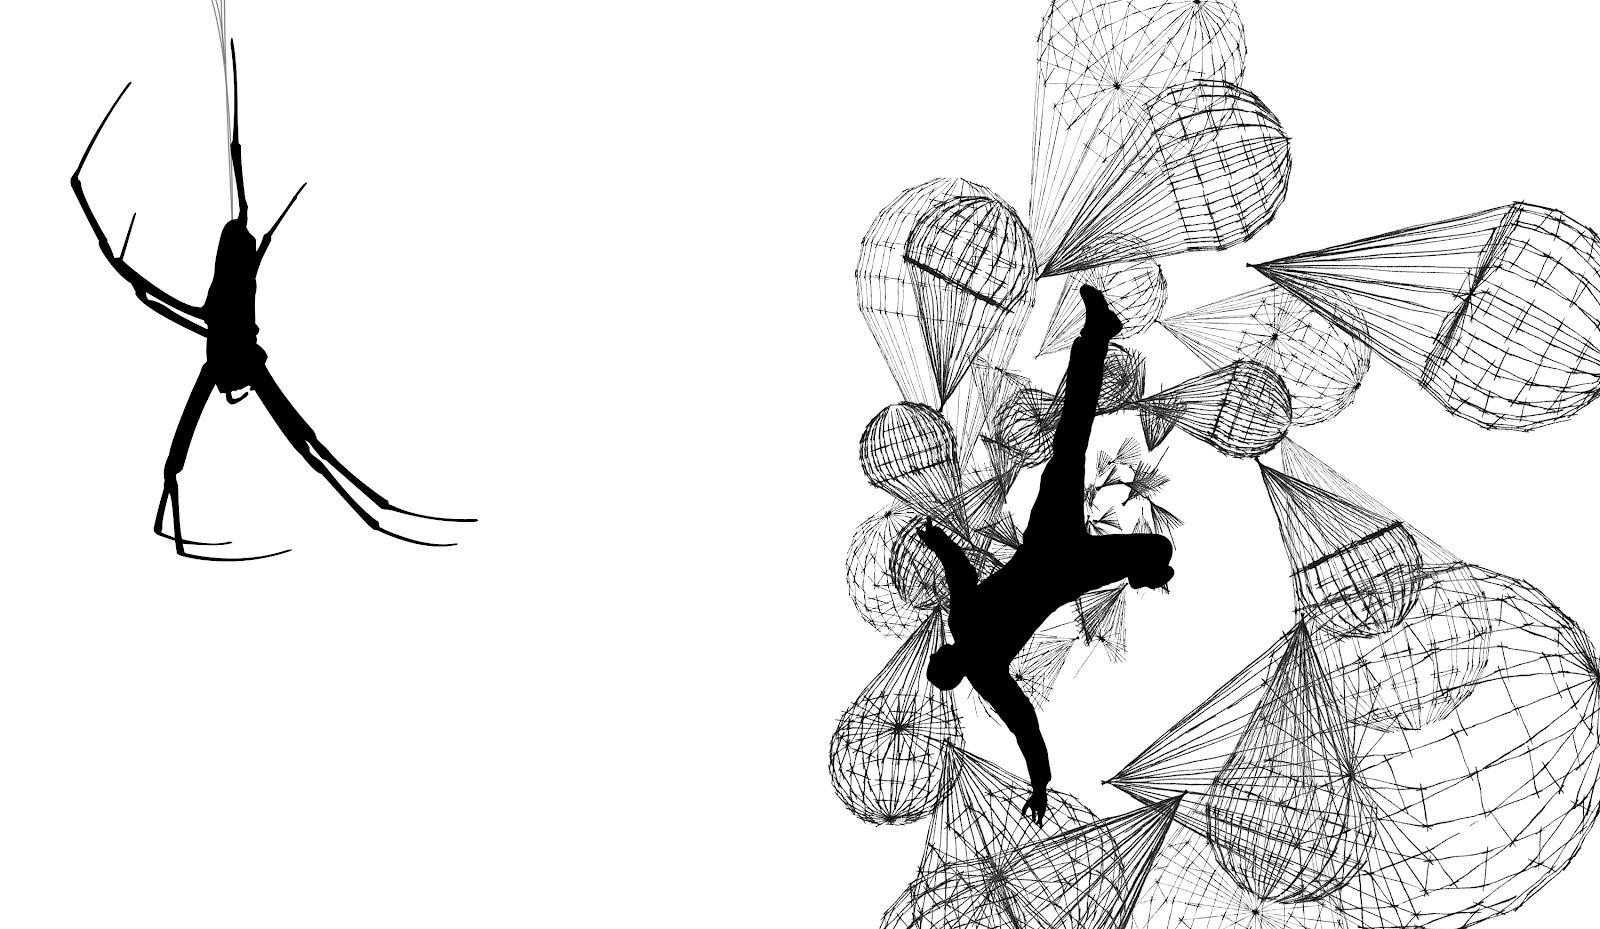 Phillip Rubery Digital Design 2012: Adding Entourage in